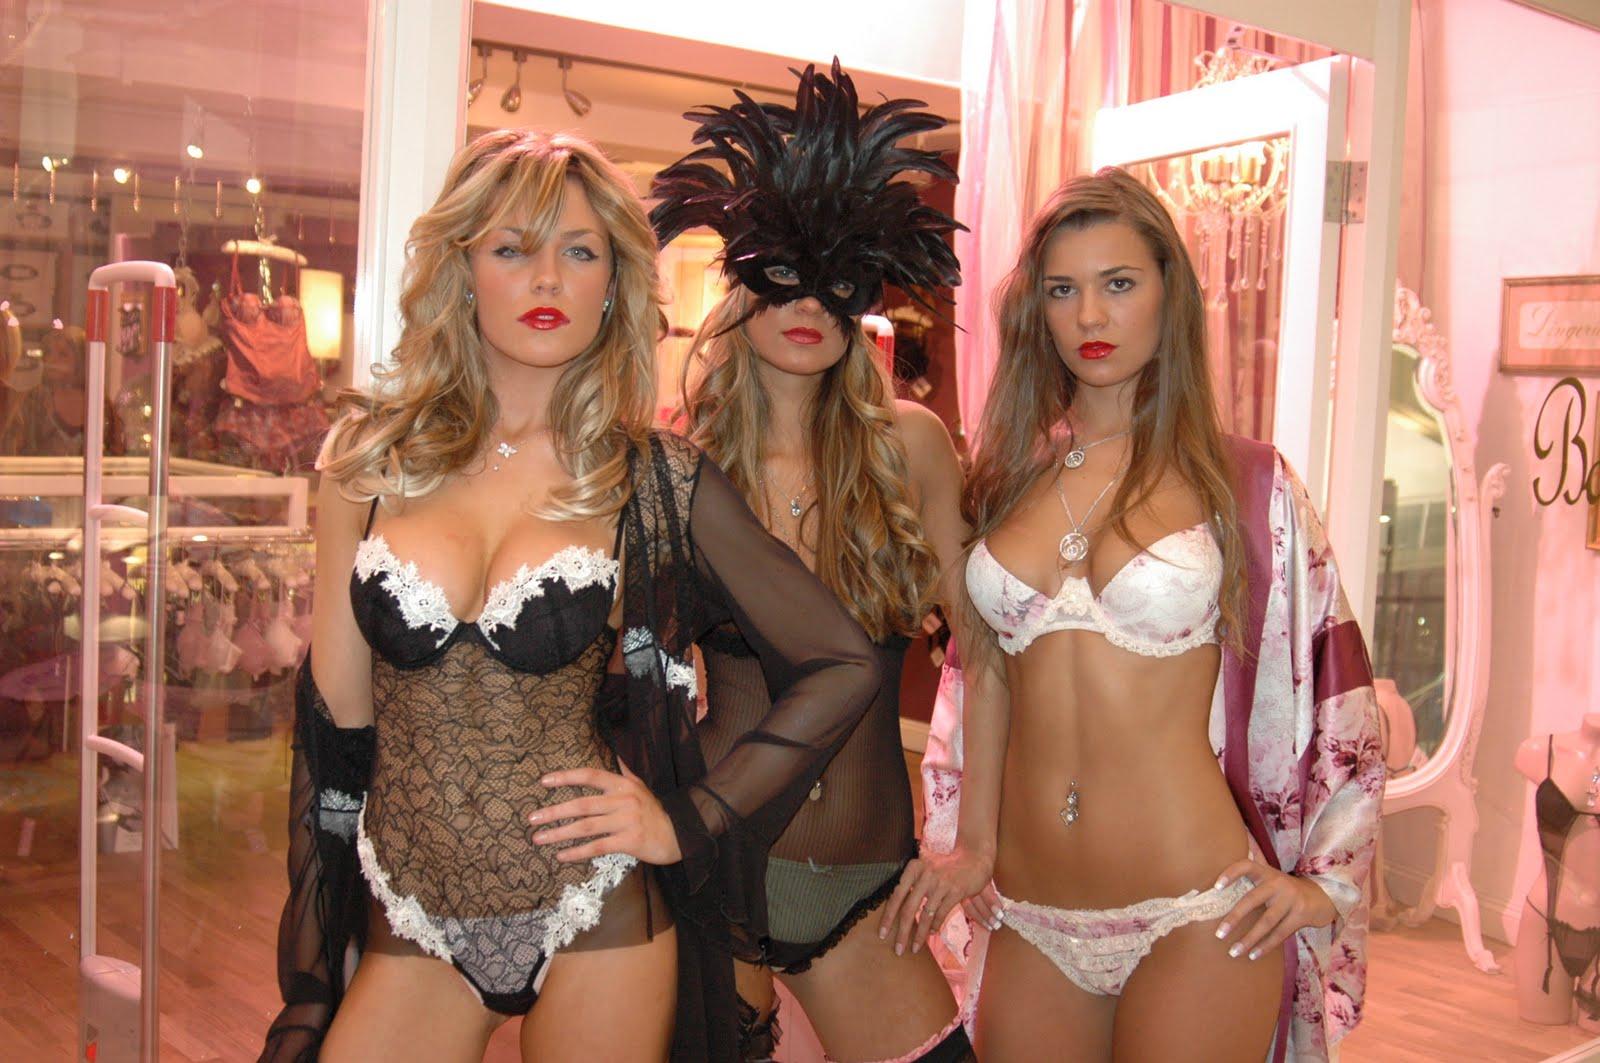 http://4.bp.blogspot.com/-gbbMGaclCFs/Tg3LZ8LxL5I/AAAAAAAAAPI/2I1-Czr-IvI/s1600/Abby+Clancy%252C+Shelly+and+Christine+Martin.jpg